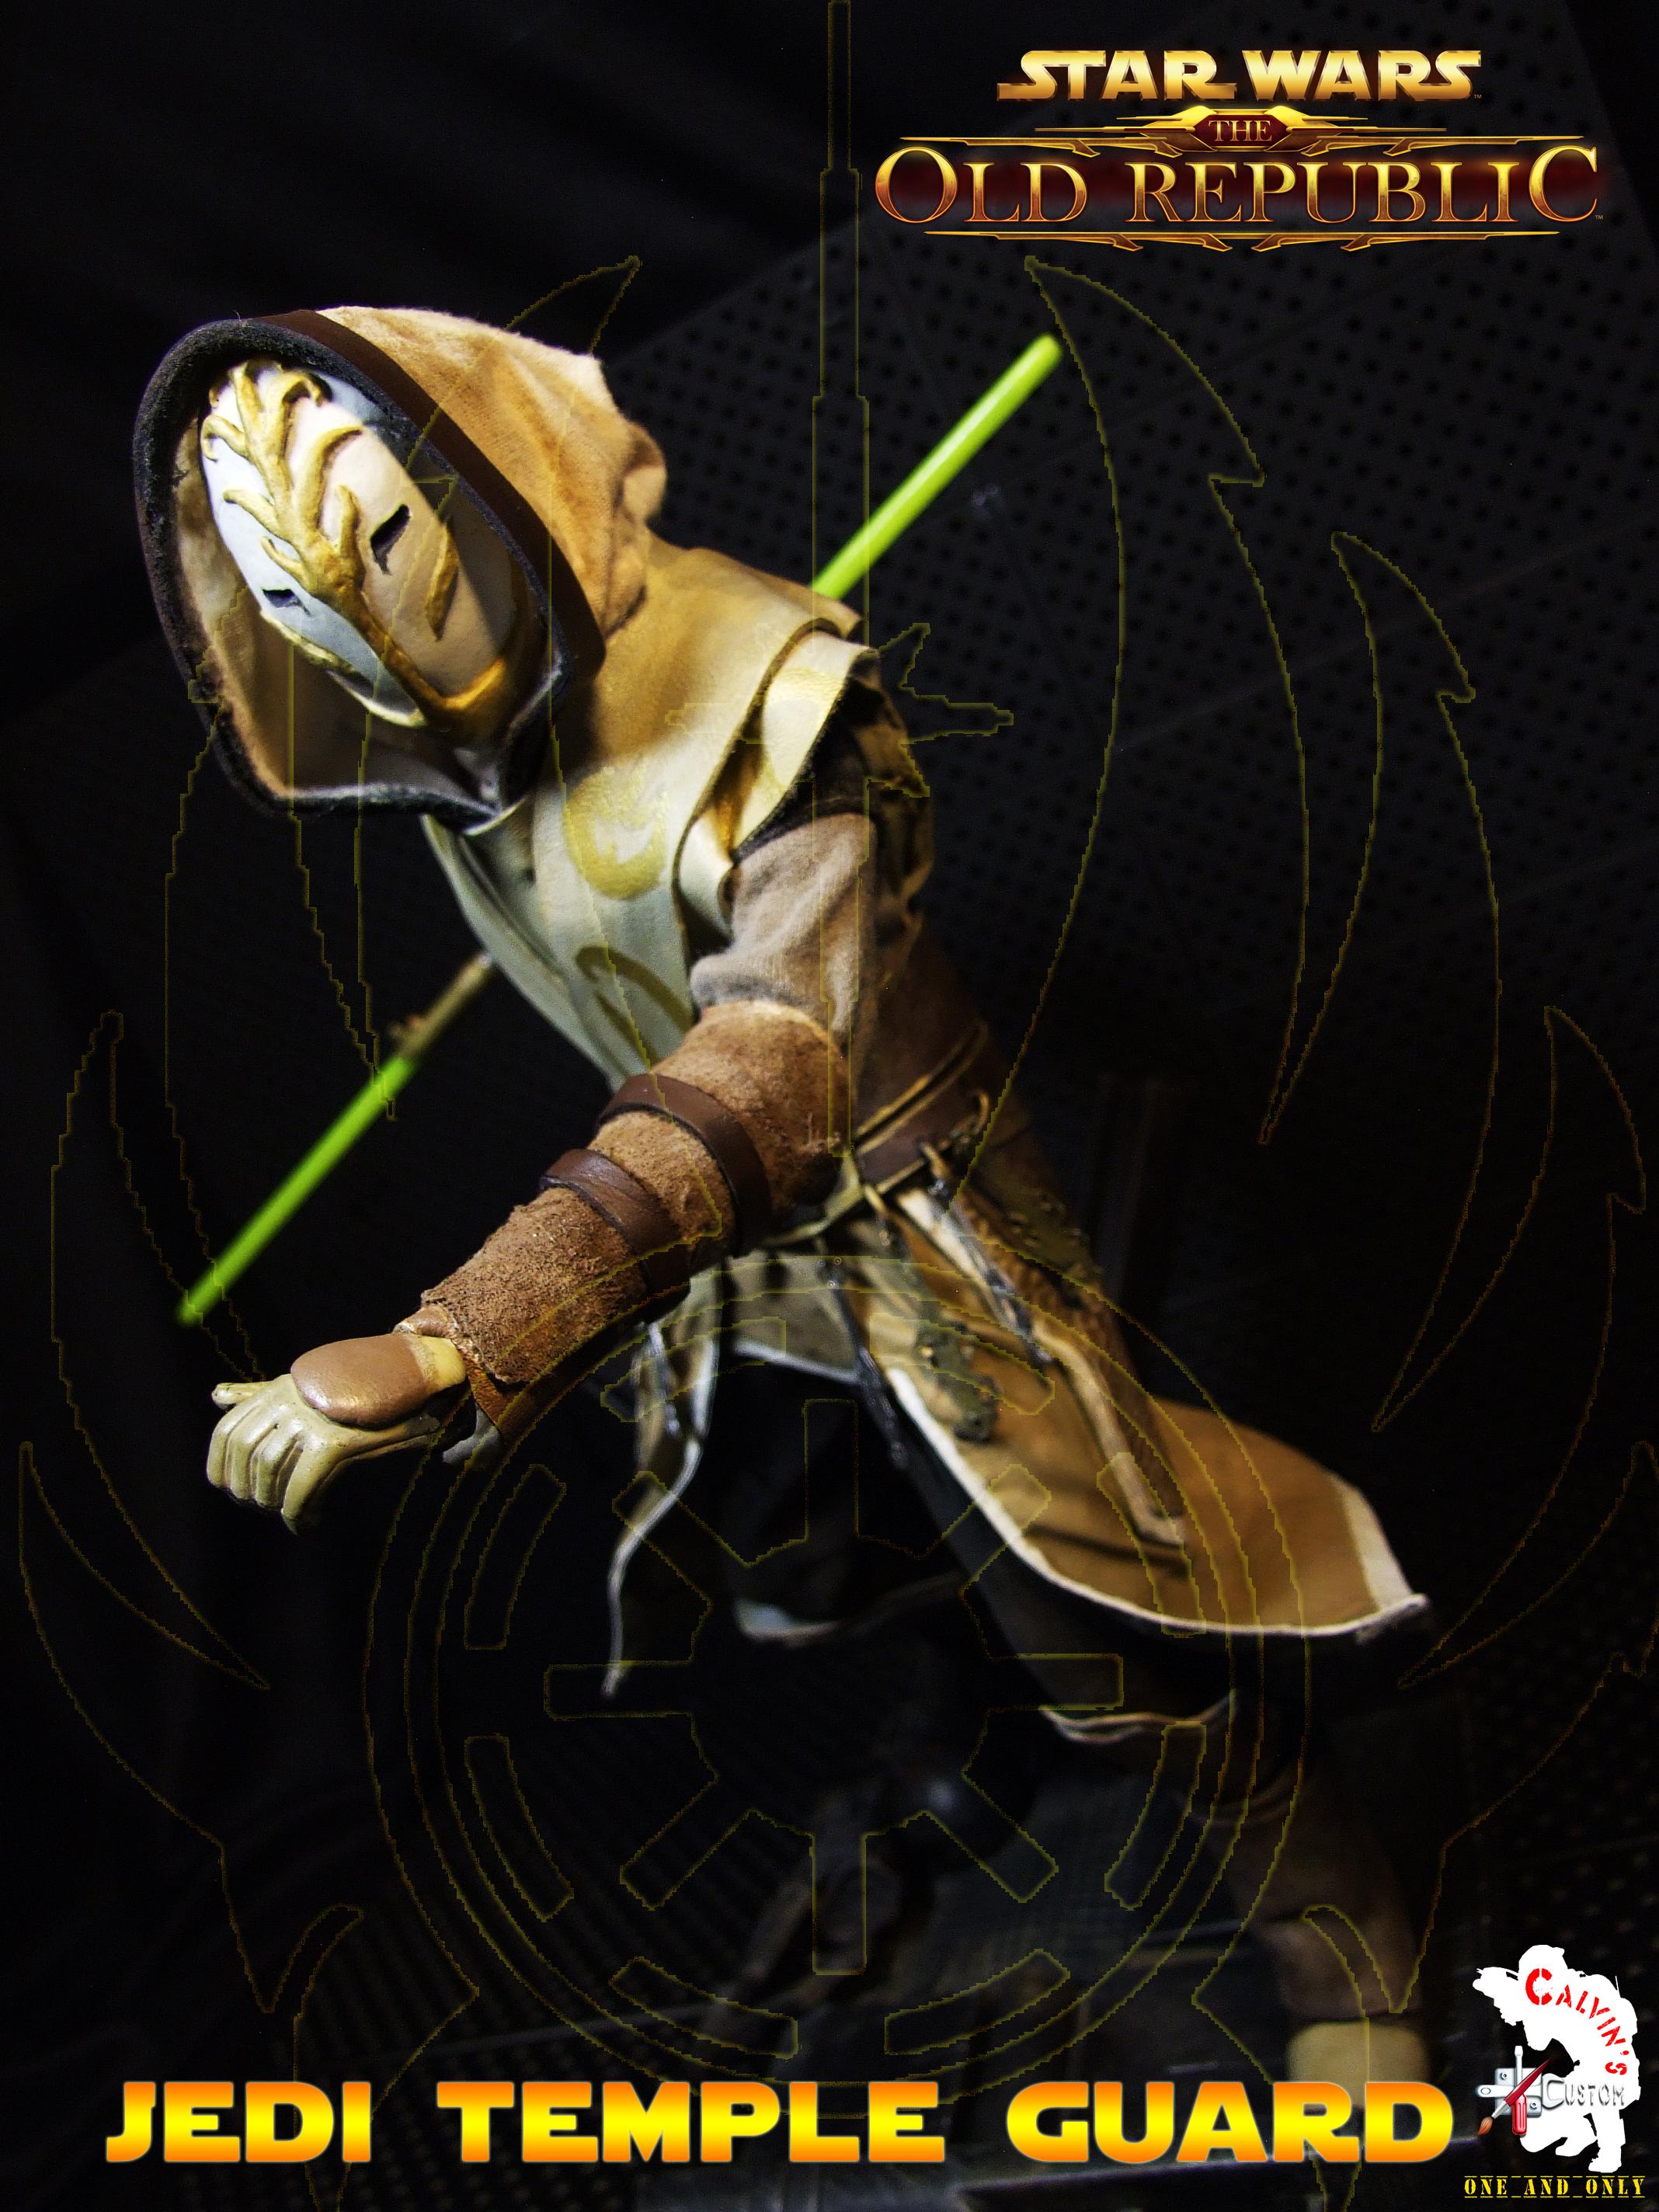 Calvin's Custom One Sixth Starwars the old republic JEDI TEMPLE GUARD figure